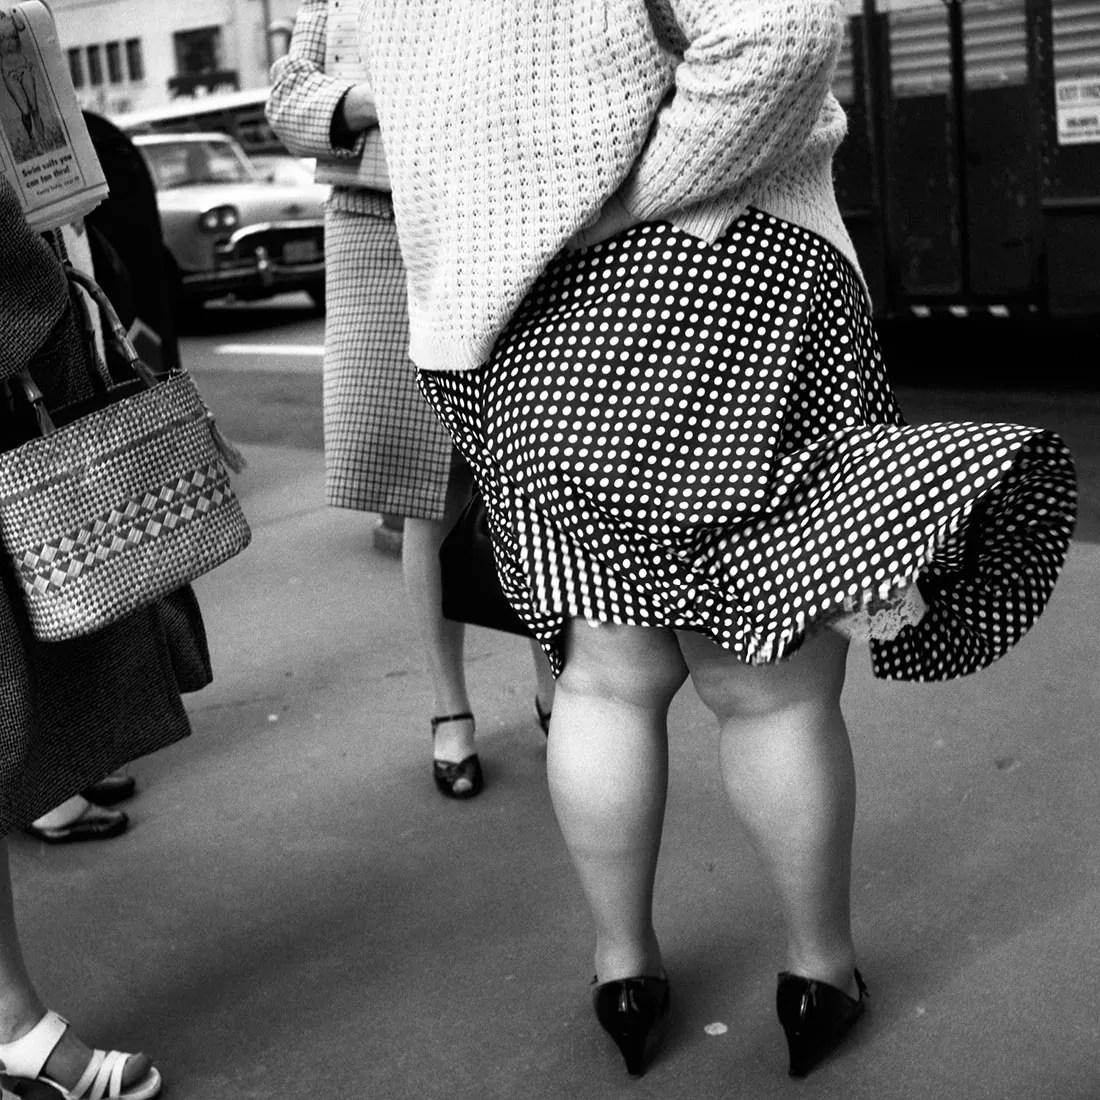 982 - Una storia Meravigliosa: Vivian Maier (Street Photography) - fotostreet.it